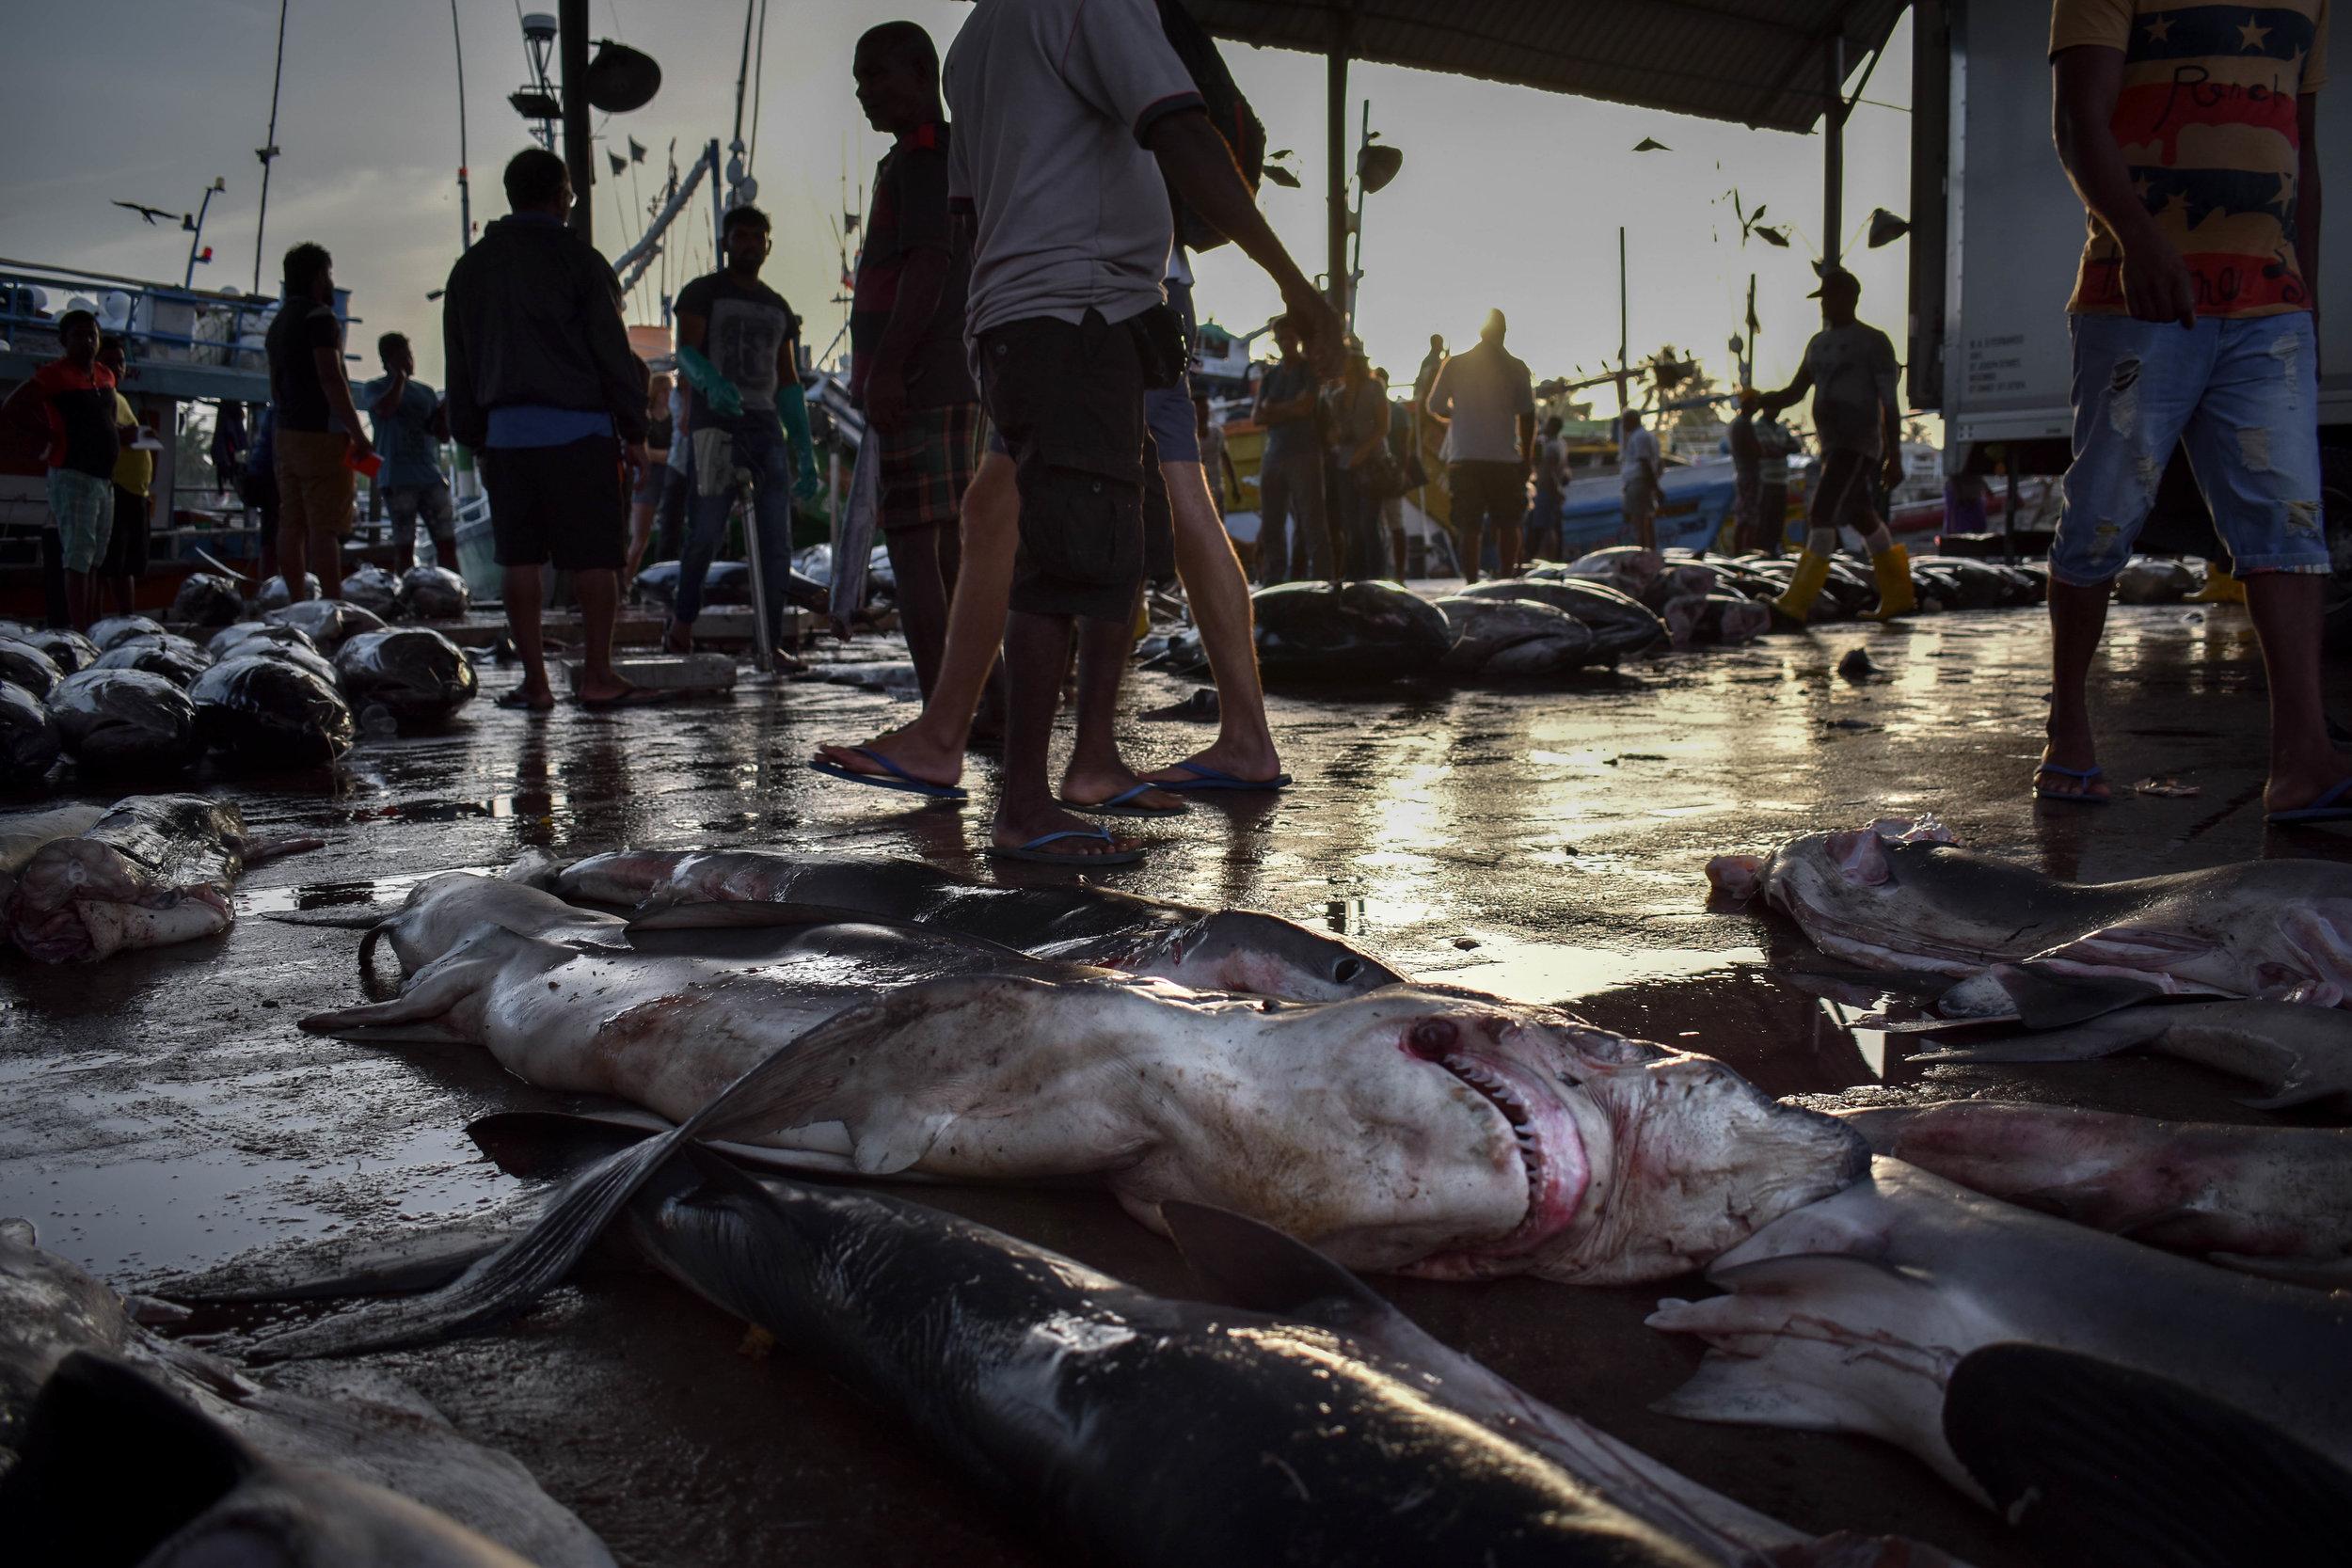 is farmed fish better than wild fish